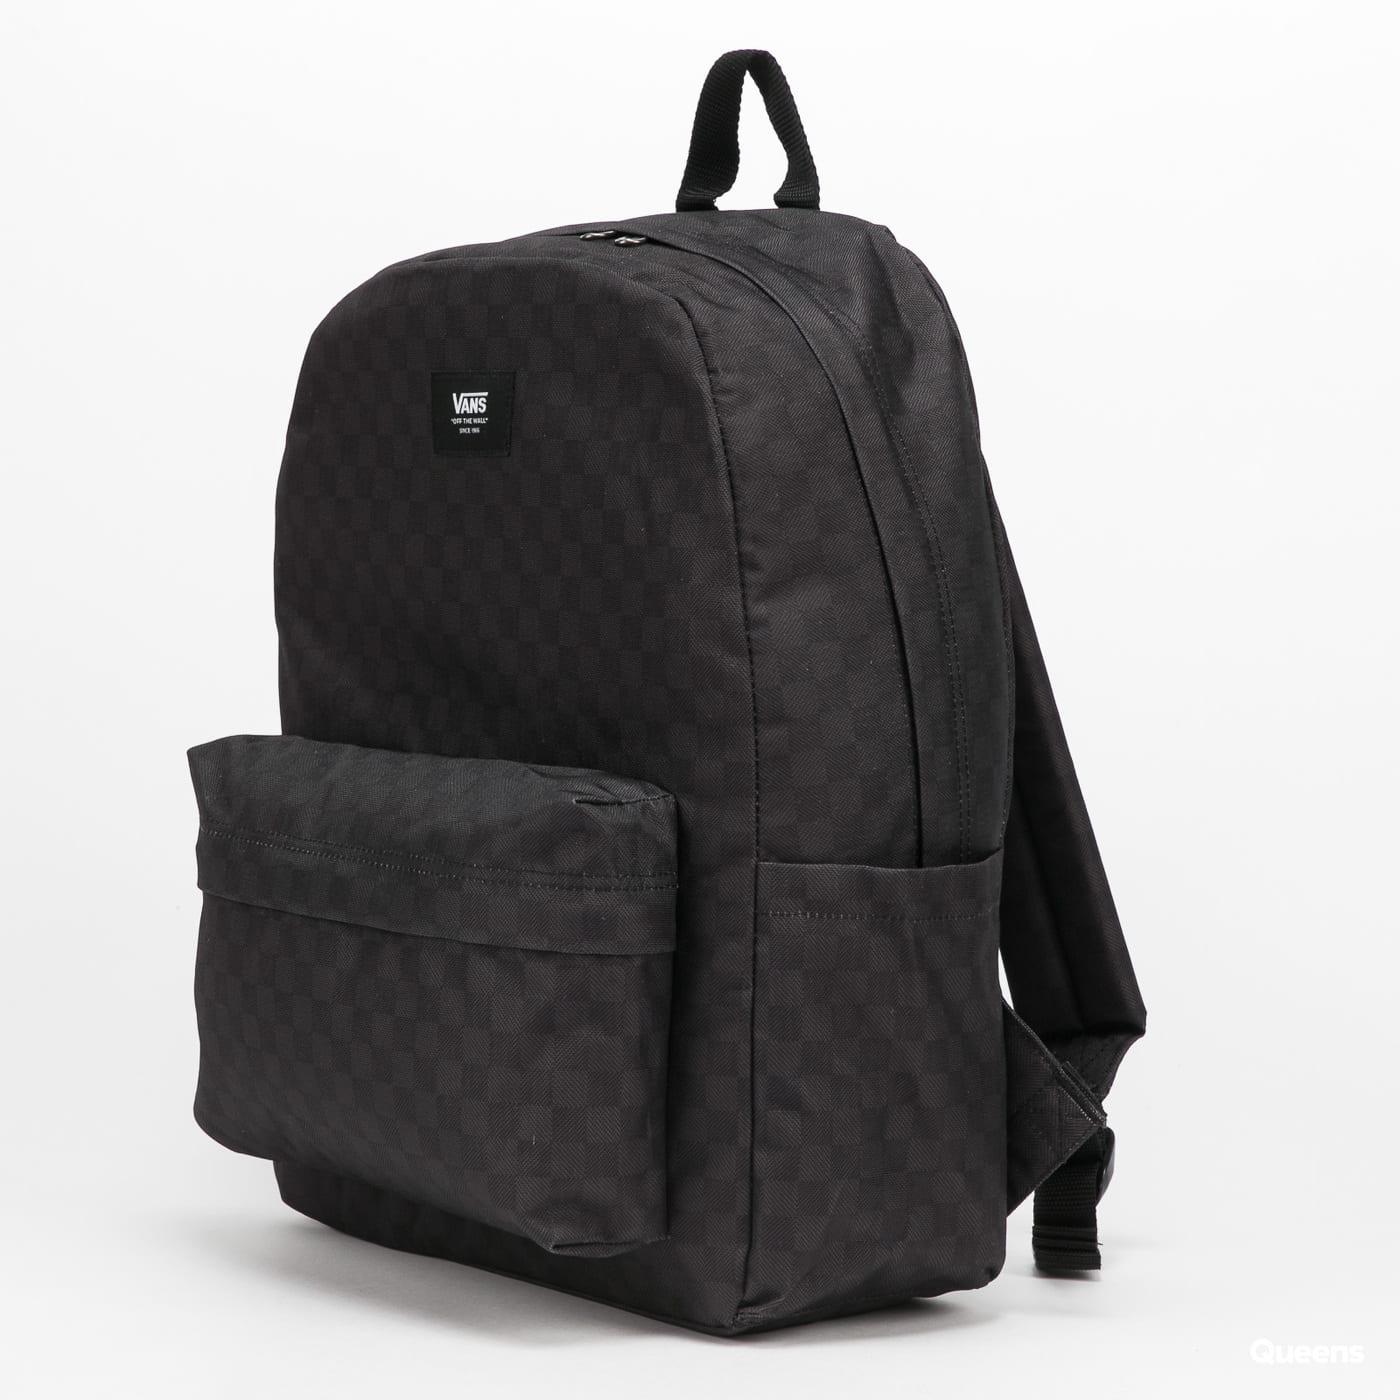 Vans Old Skool Check Backpack černý / tmavě šedý